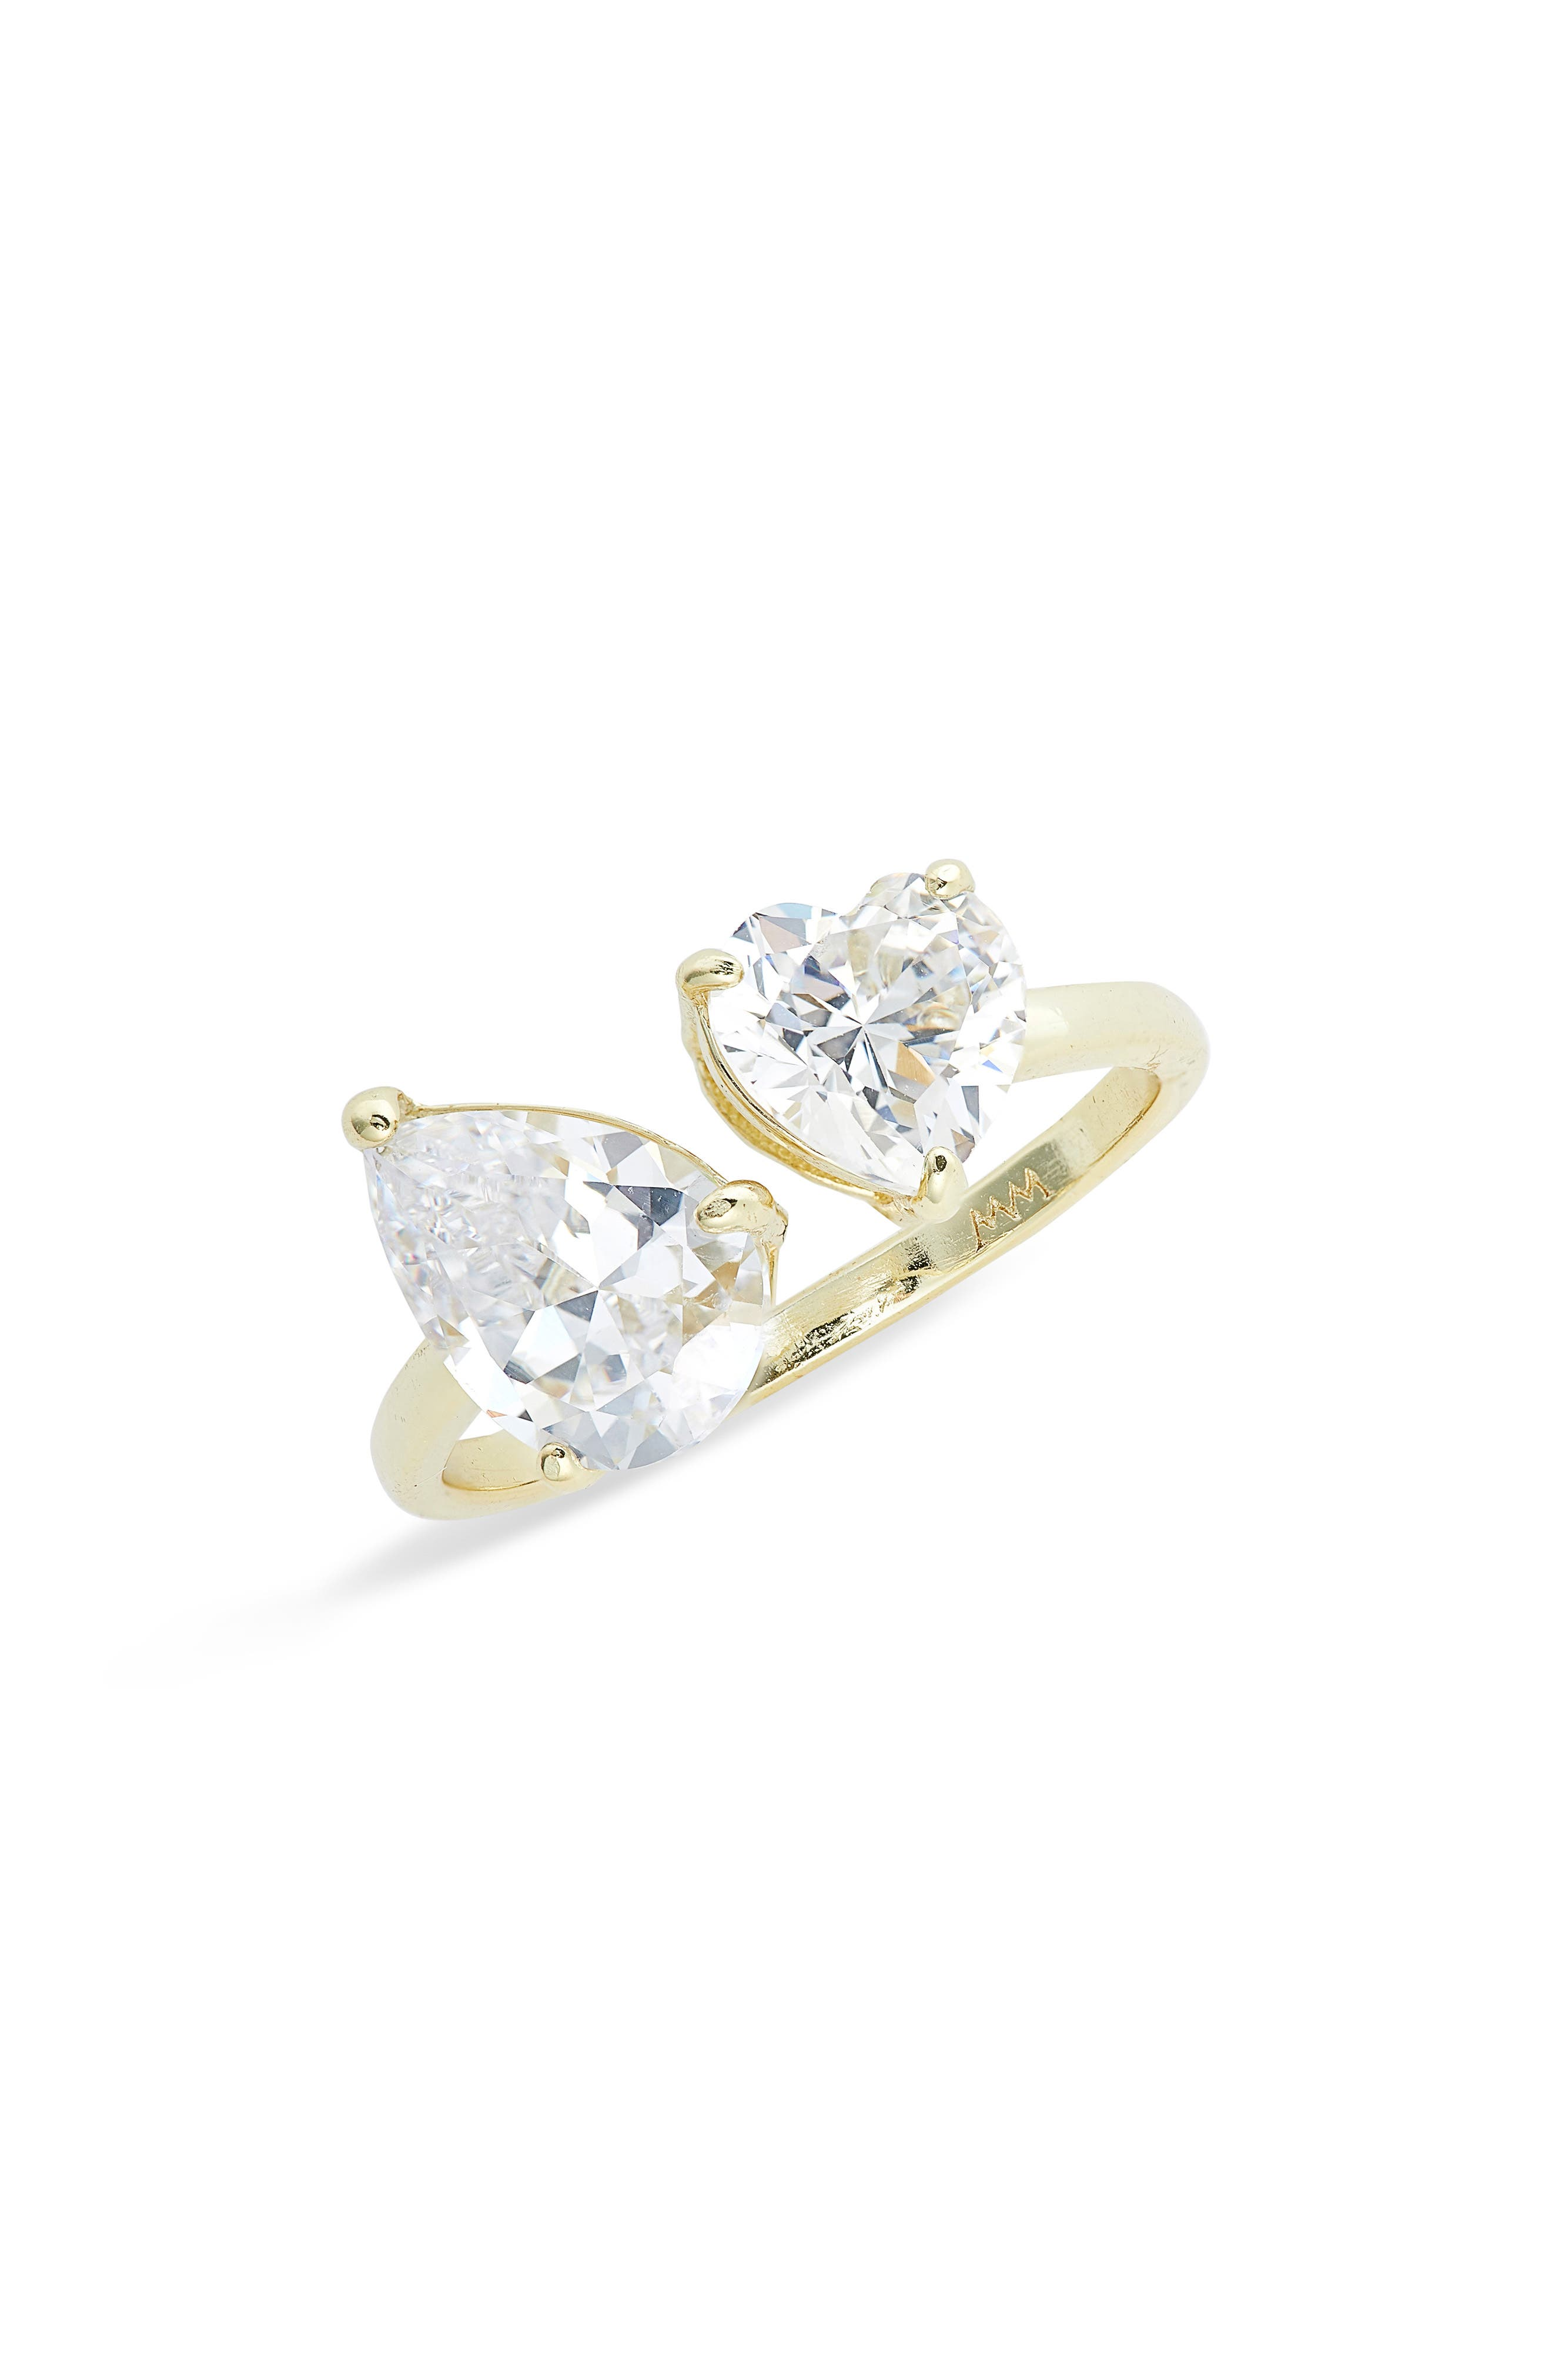 Erika Cubic Zirconia Ring